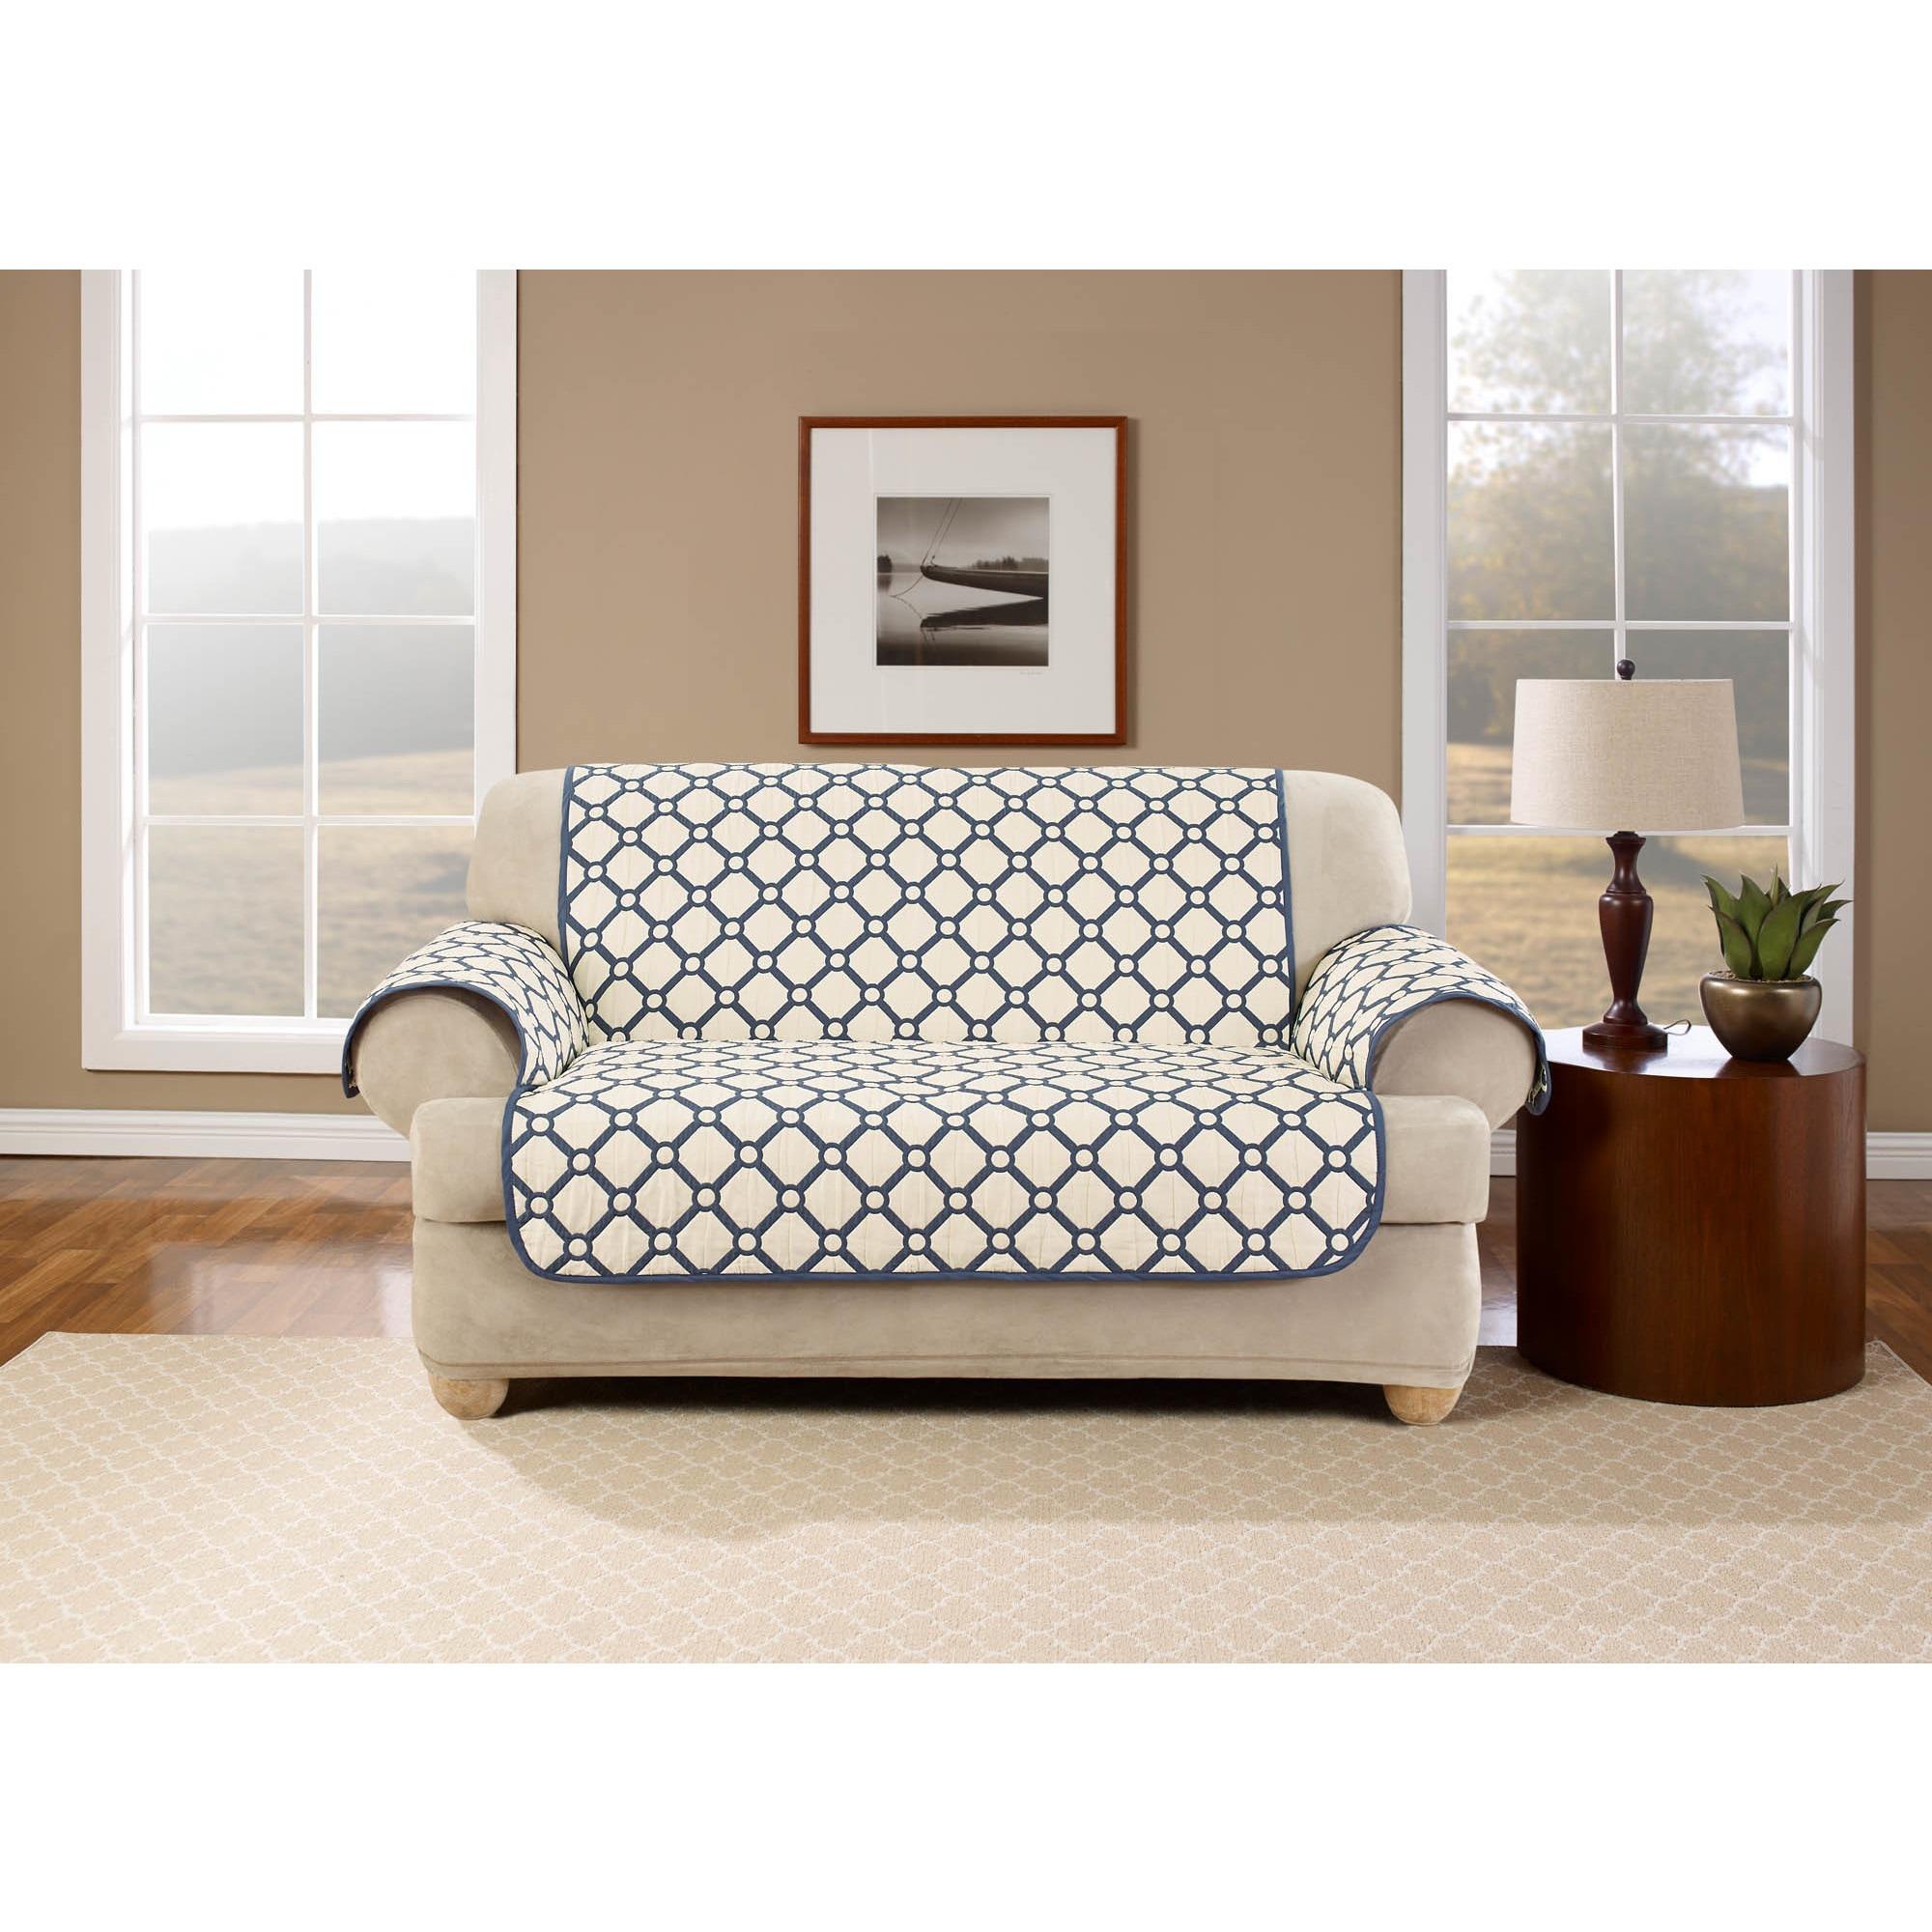 Belle Maison Peyton Reversible Sofa Protector Free Shipping Today 18258279